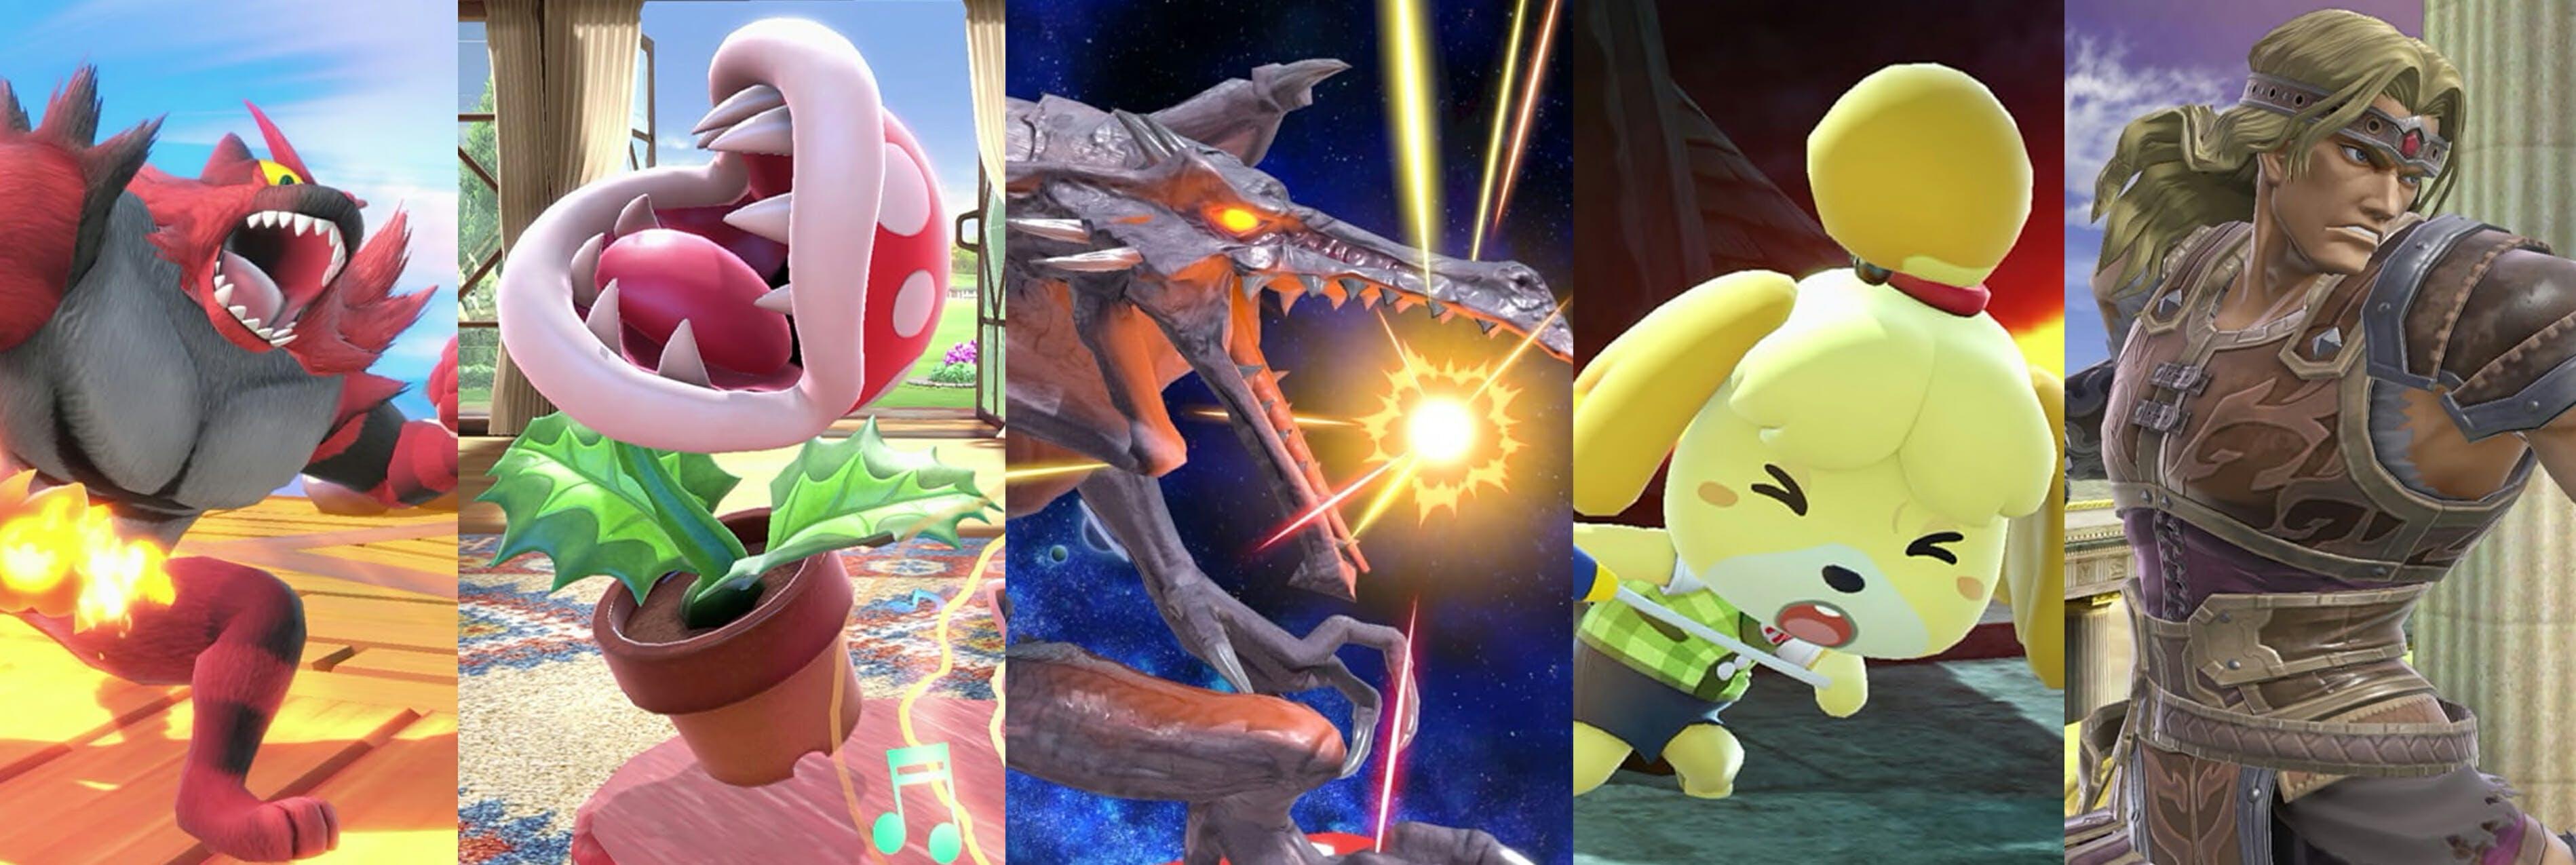 Smash bros. ultimate roster